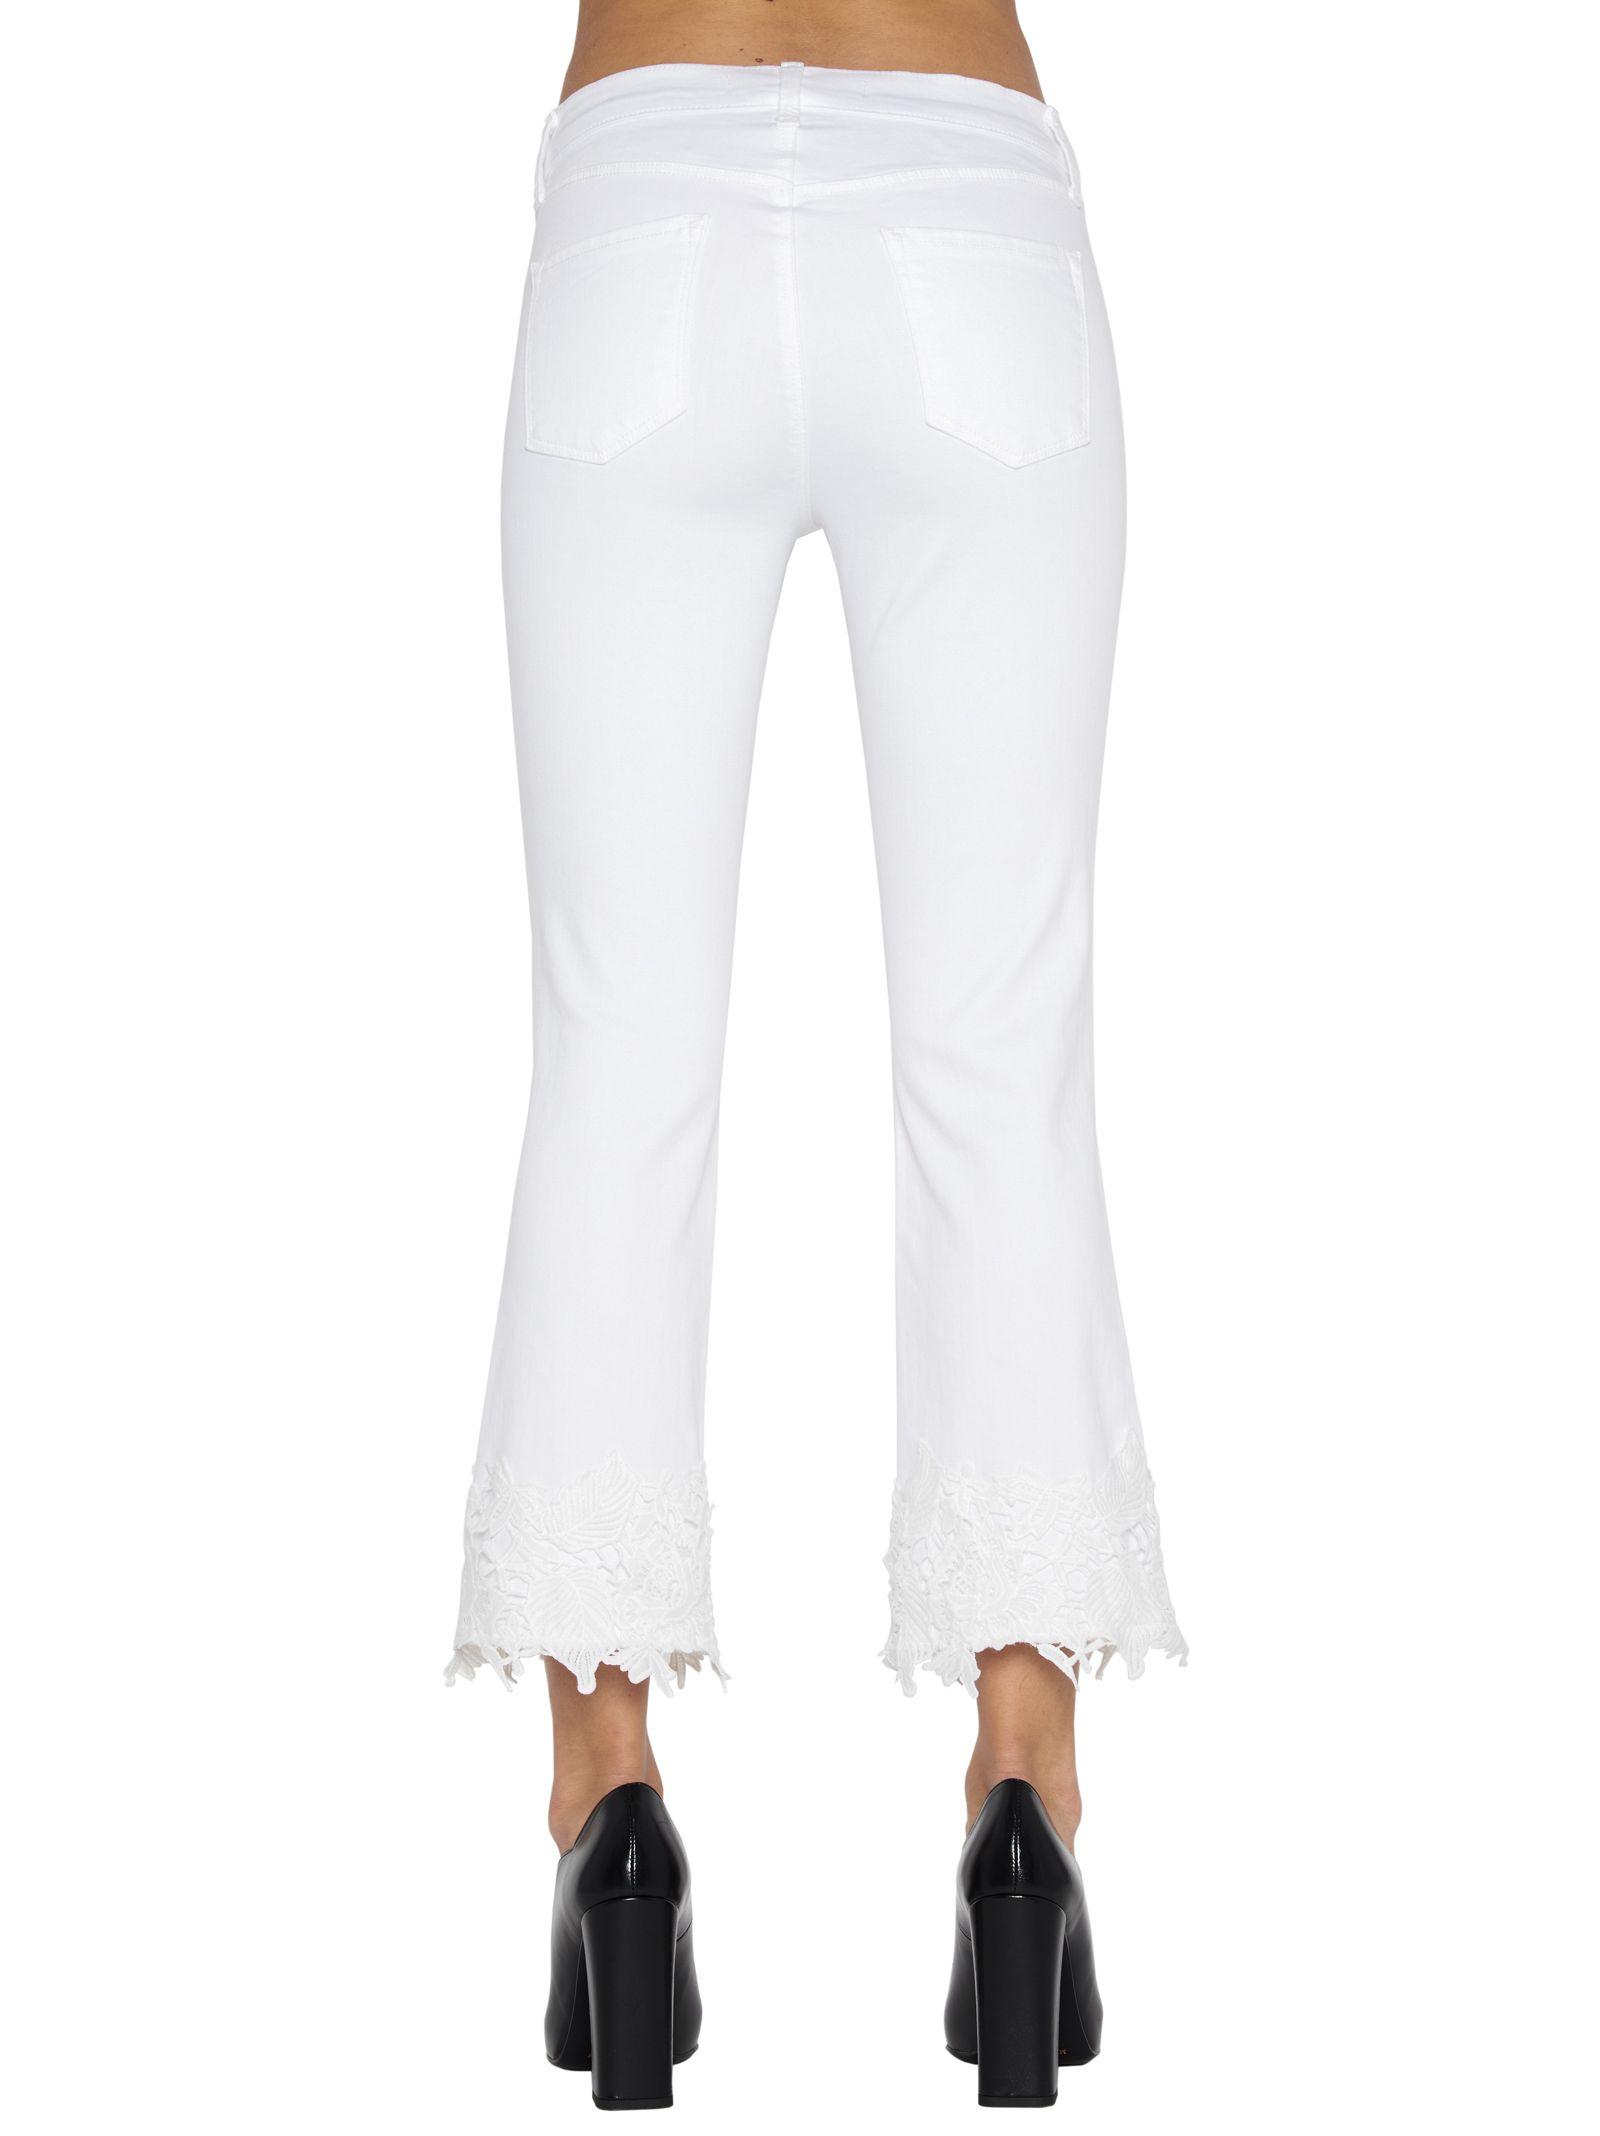 a5a9ea5653779 J Brand J Brand Selena Jeans - White - 10630065